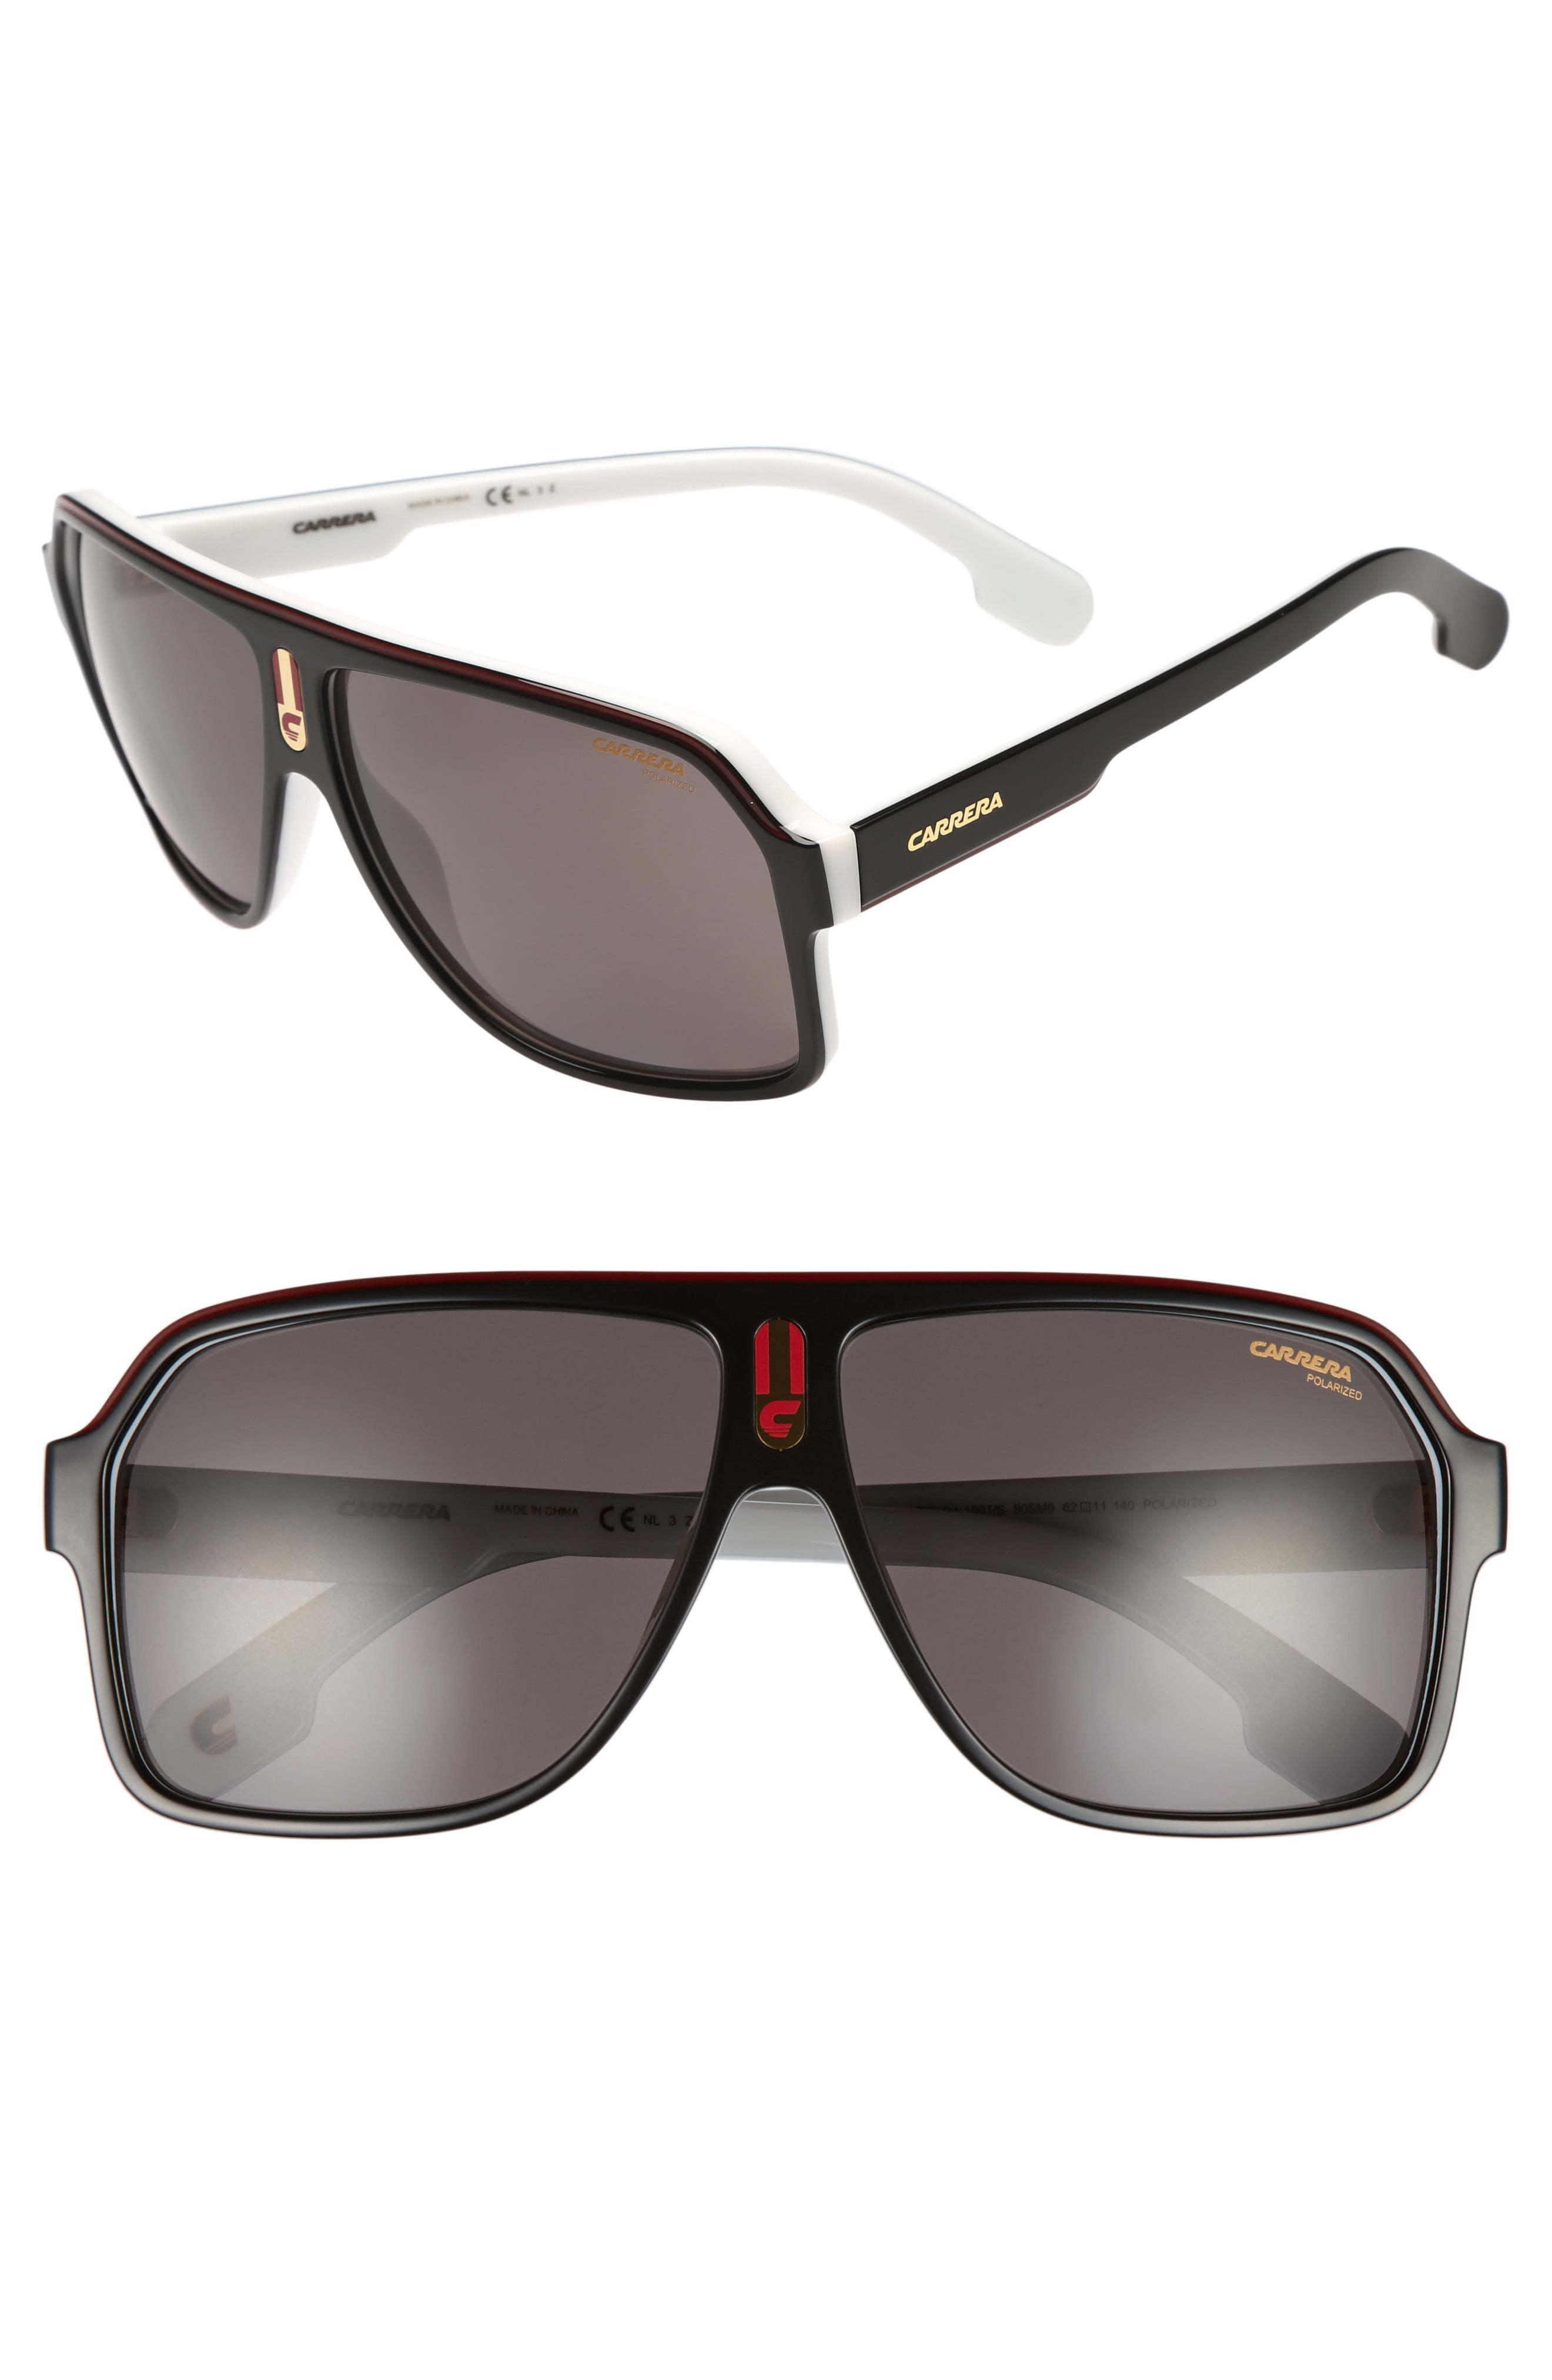 Carrera Eyewear 1001s 62mm Sunglasses